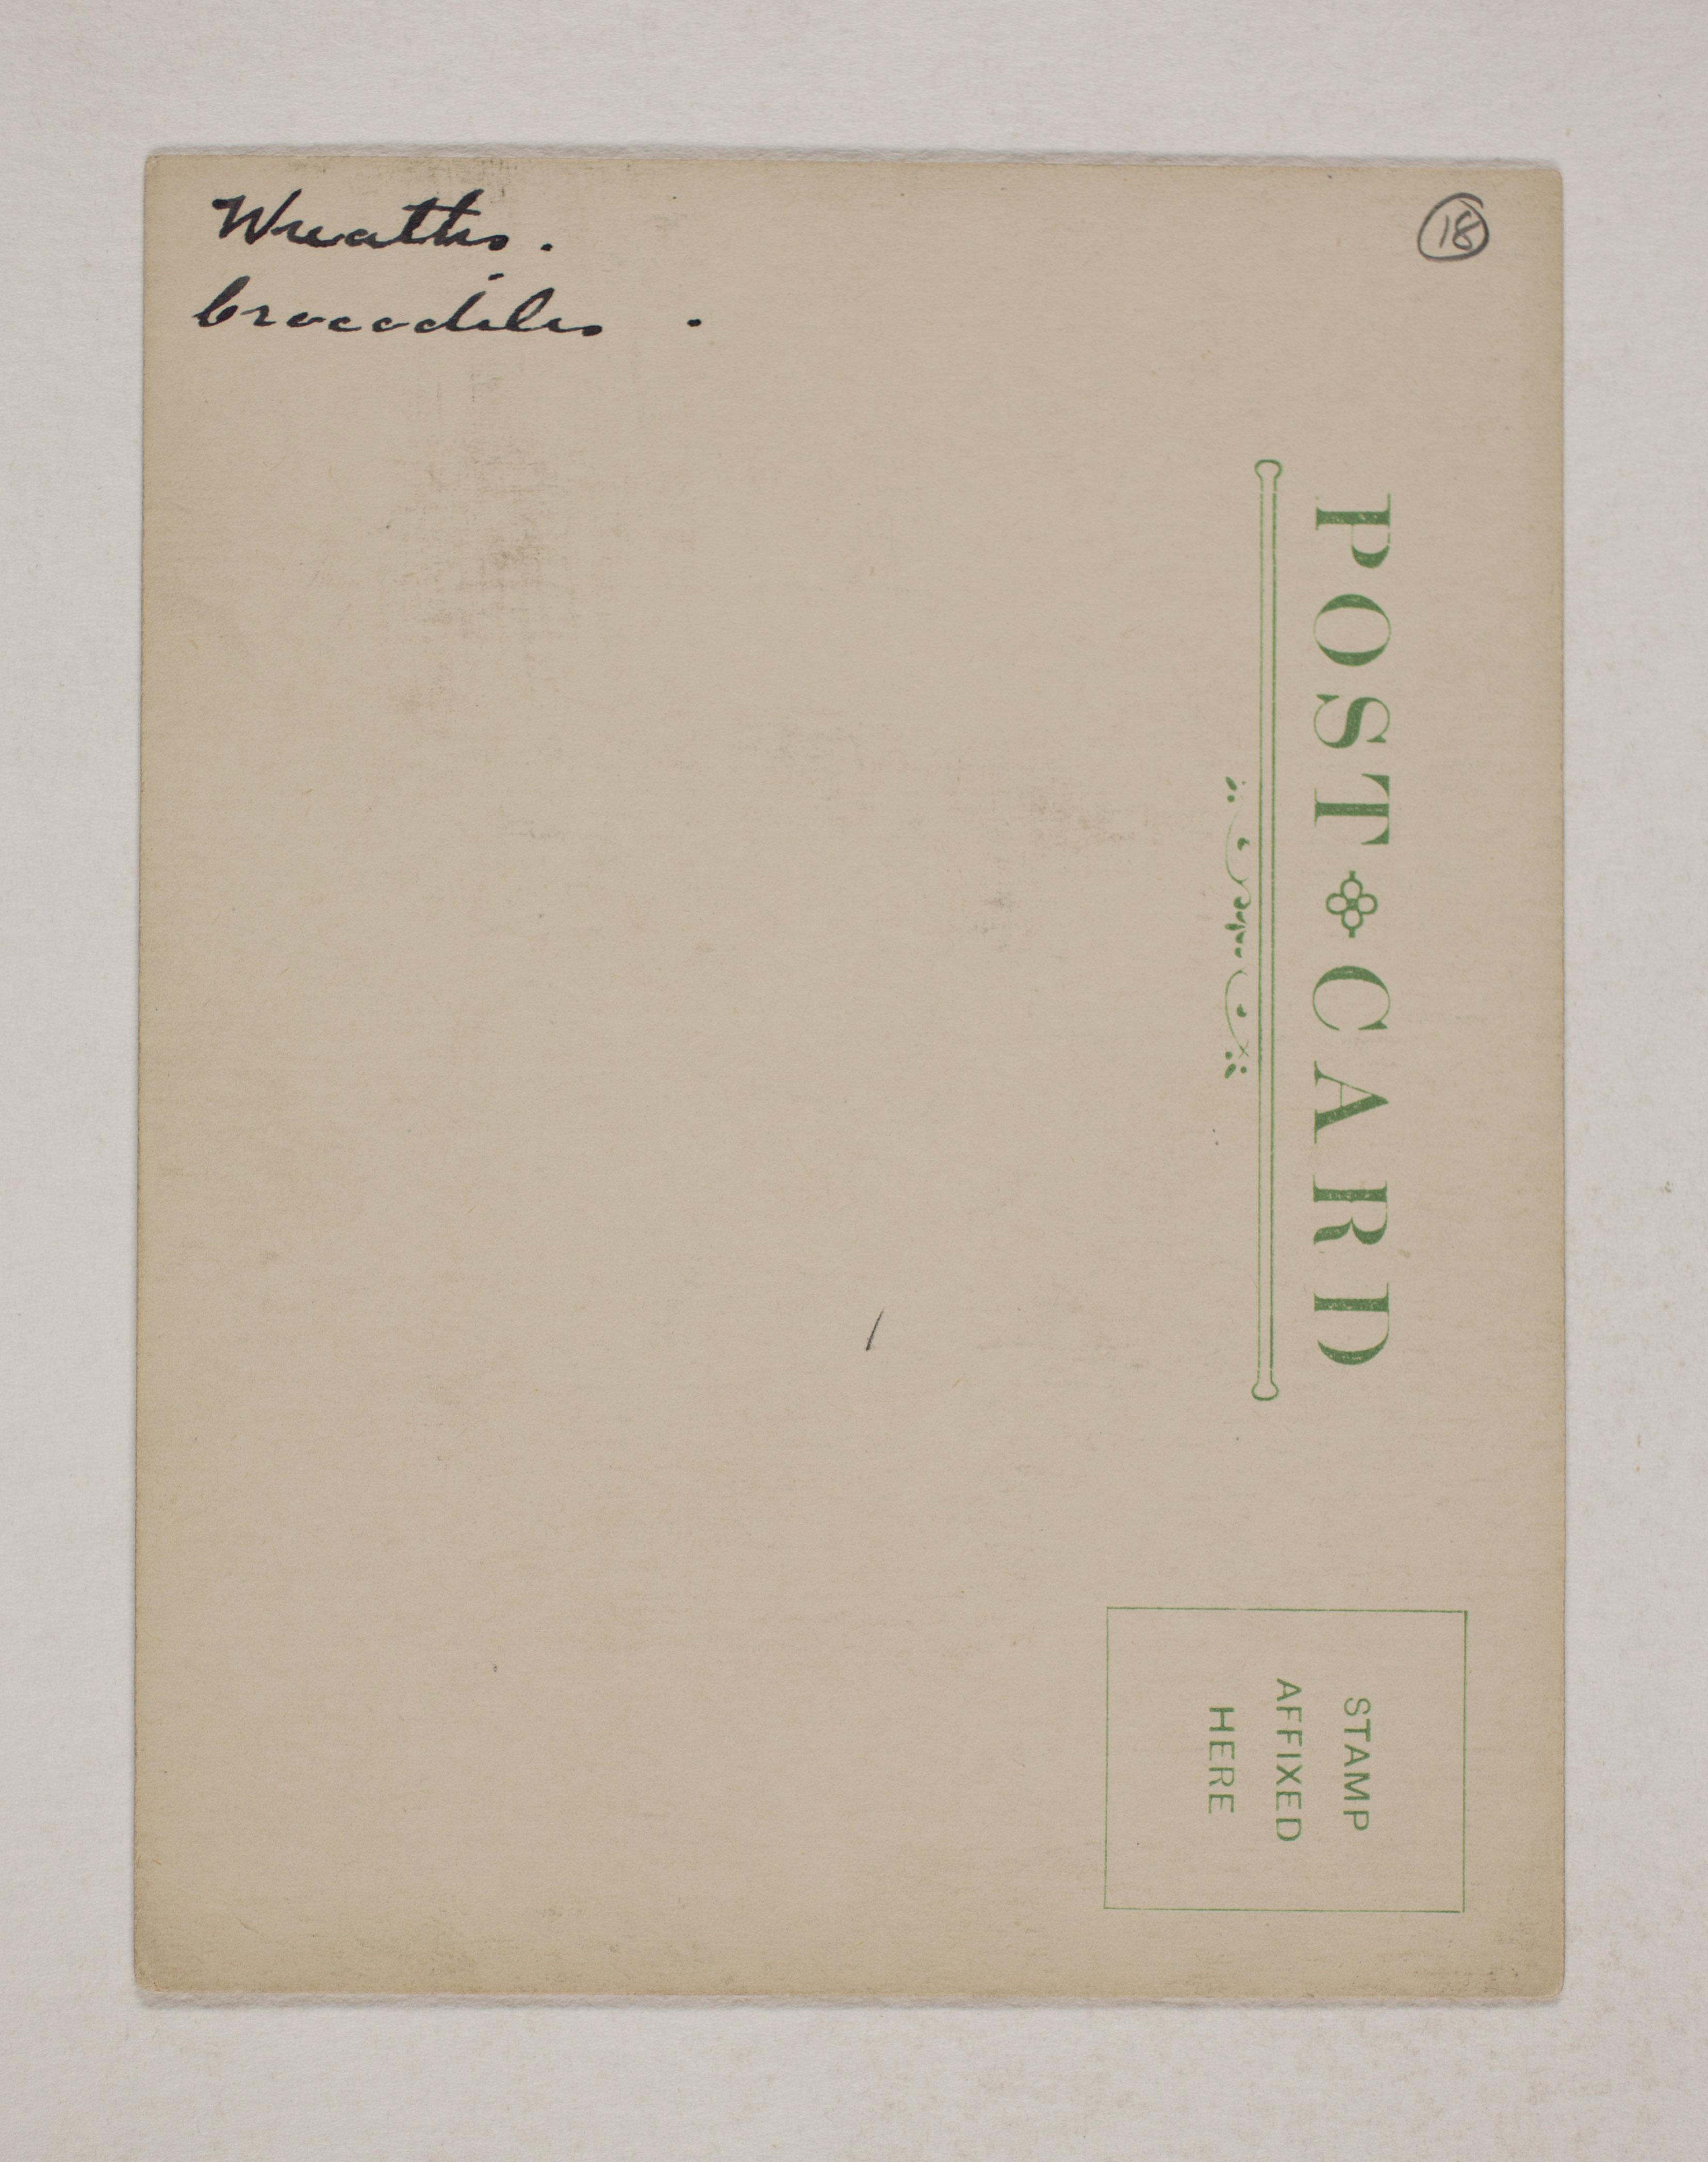 1910-11 Hawara, Gerzeh, Memphis, Mazghuneh Individual institution list  PMA/WFP1/D/19/18.2